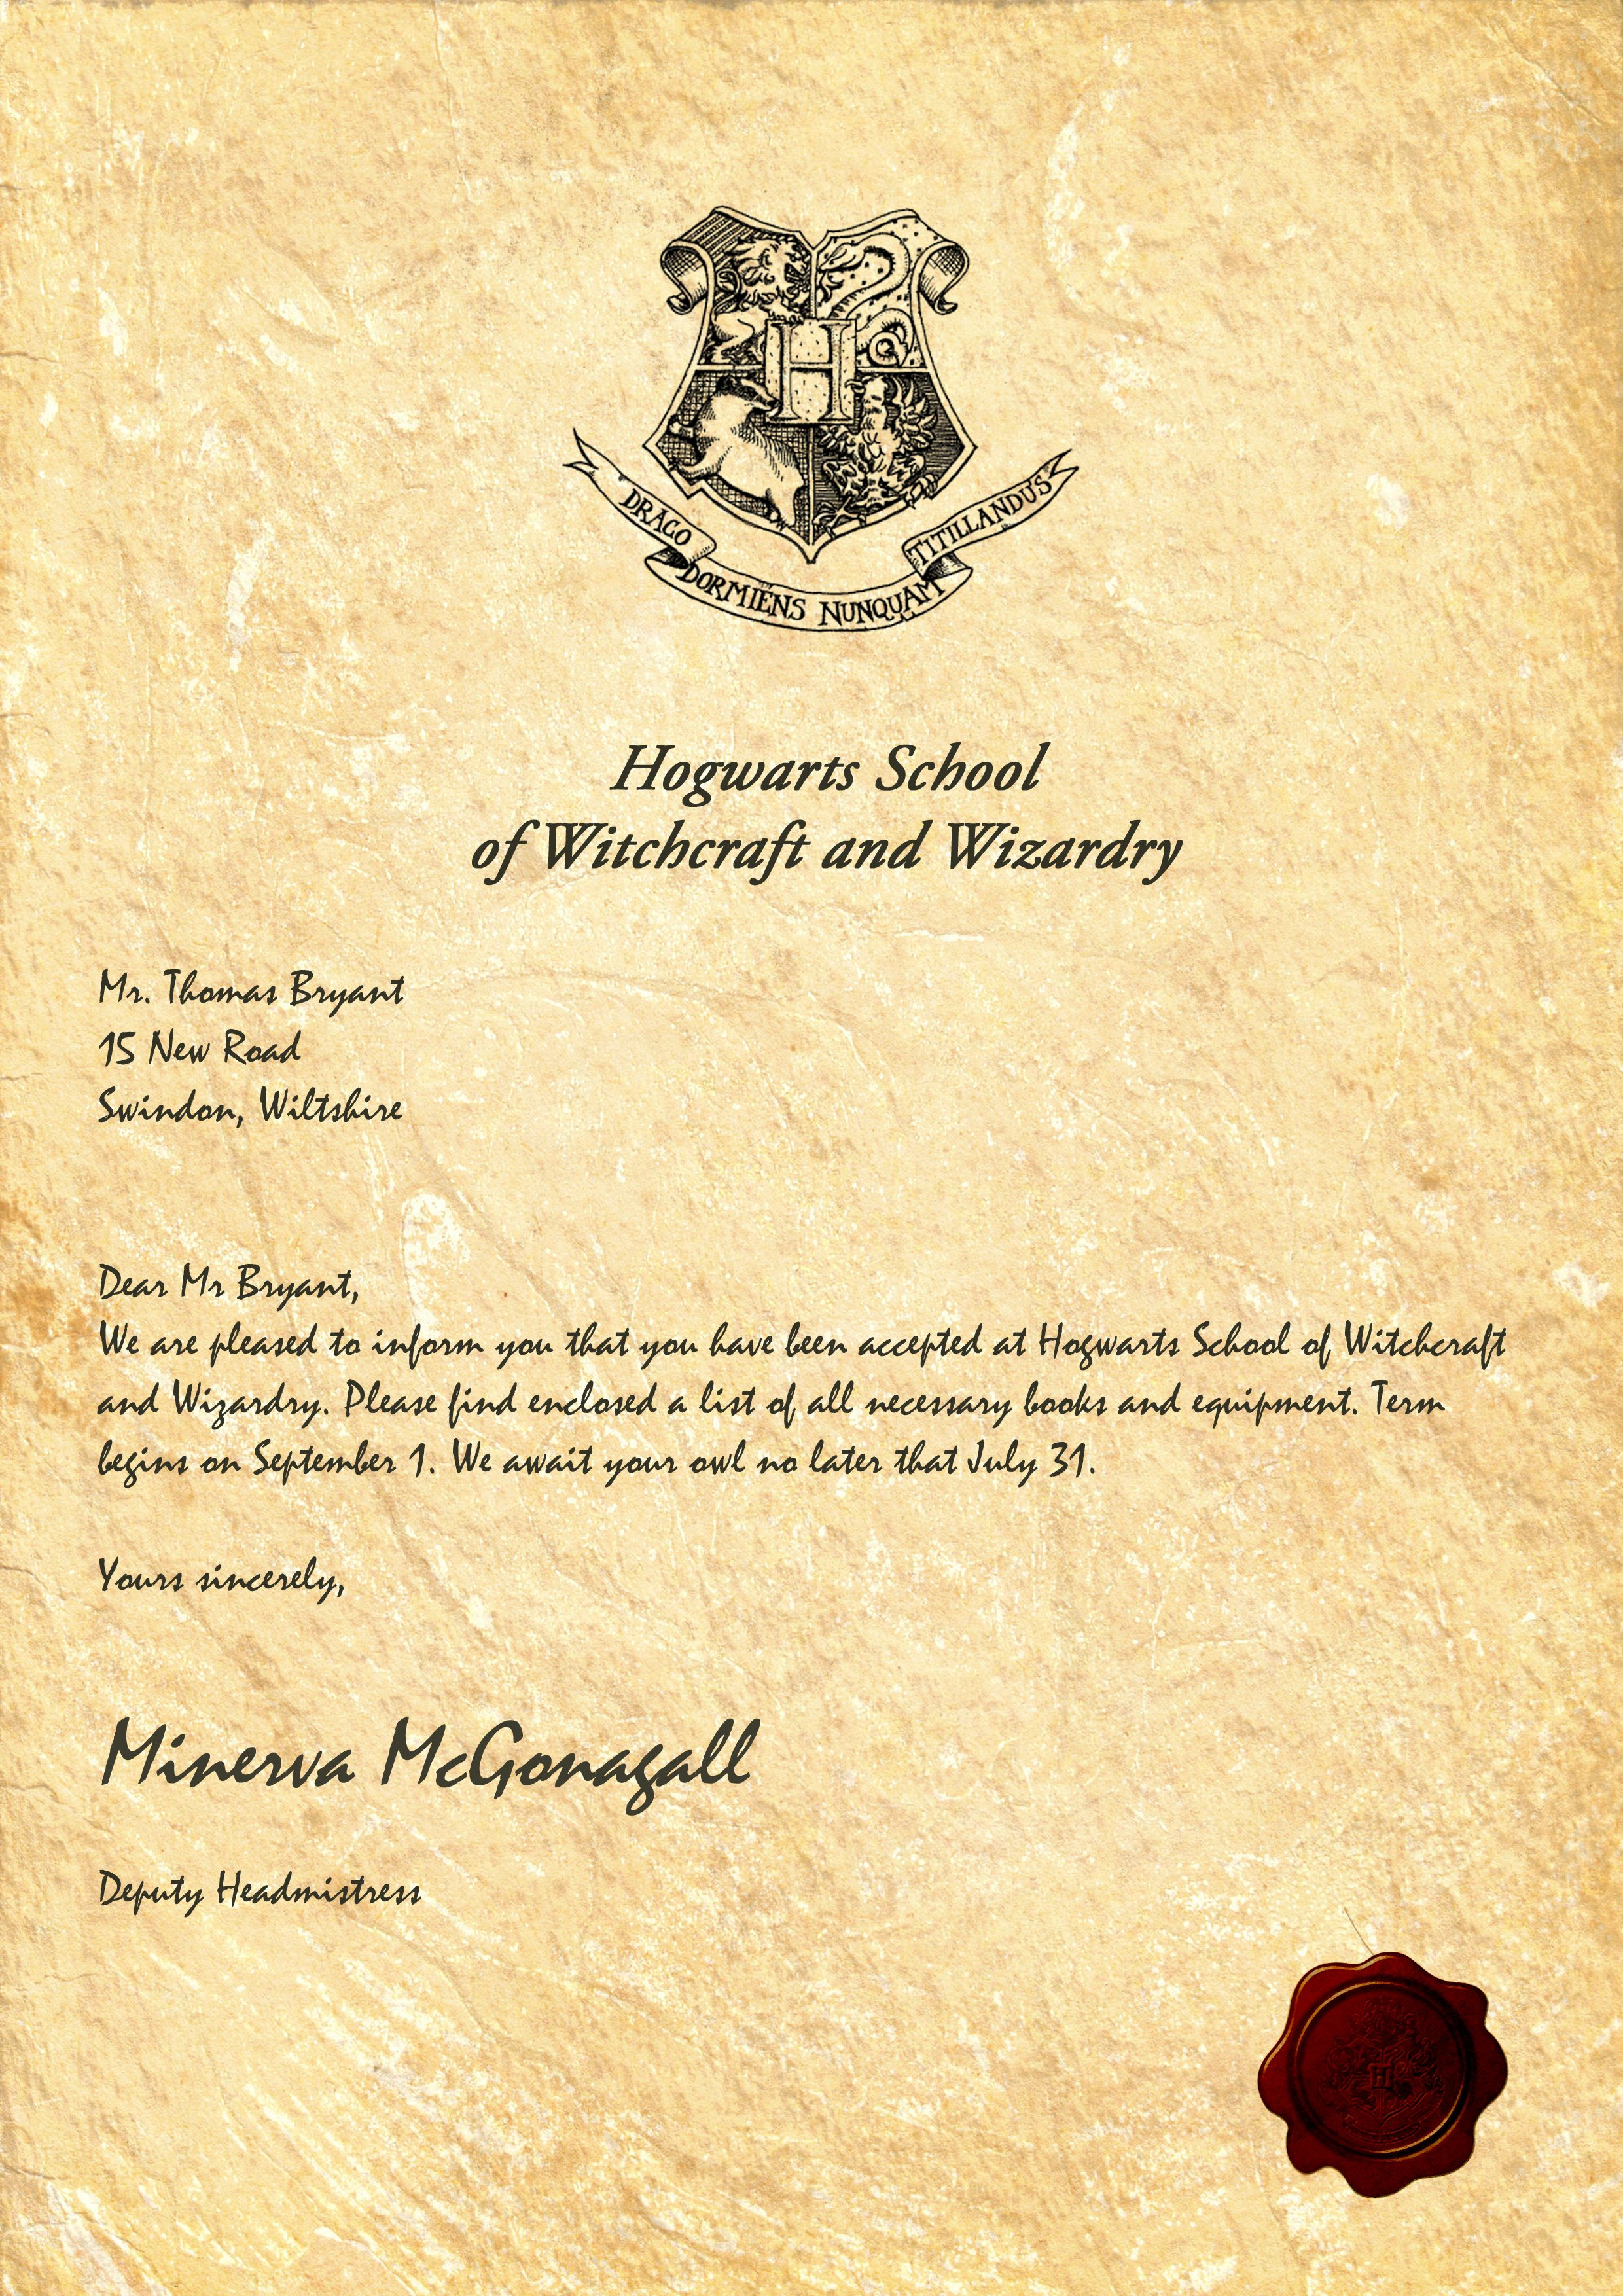 My Hogwarts Acceptance Letter Sadly My Owl Died From The Long Fly - Hogwarts Acceptance Letter Template Free Printable